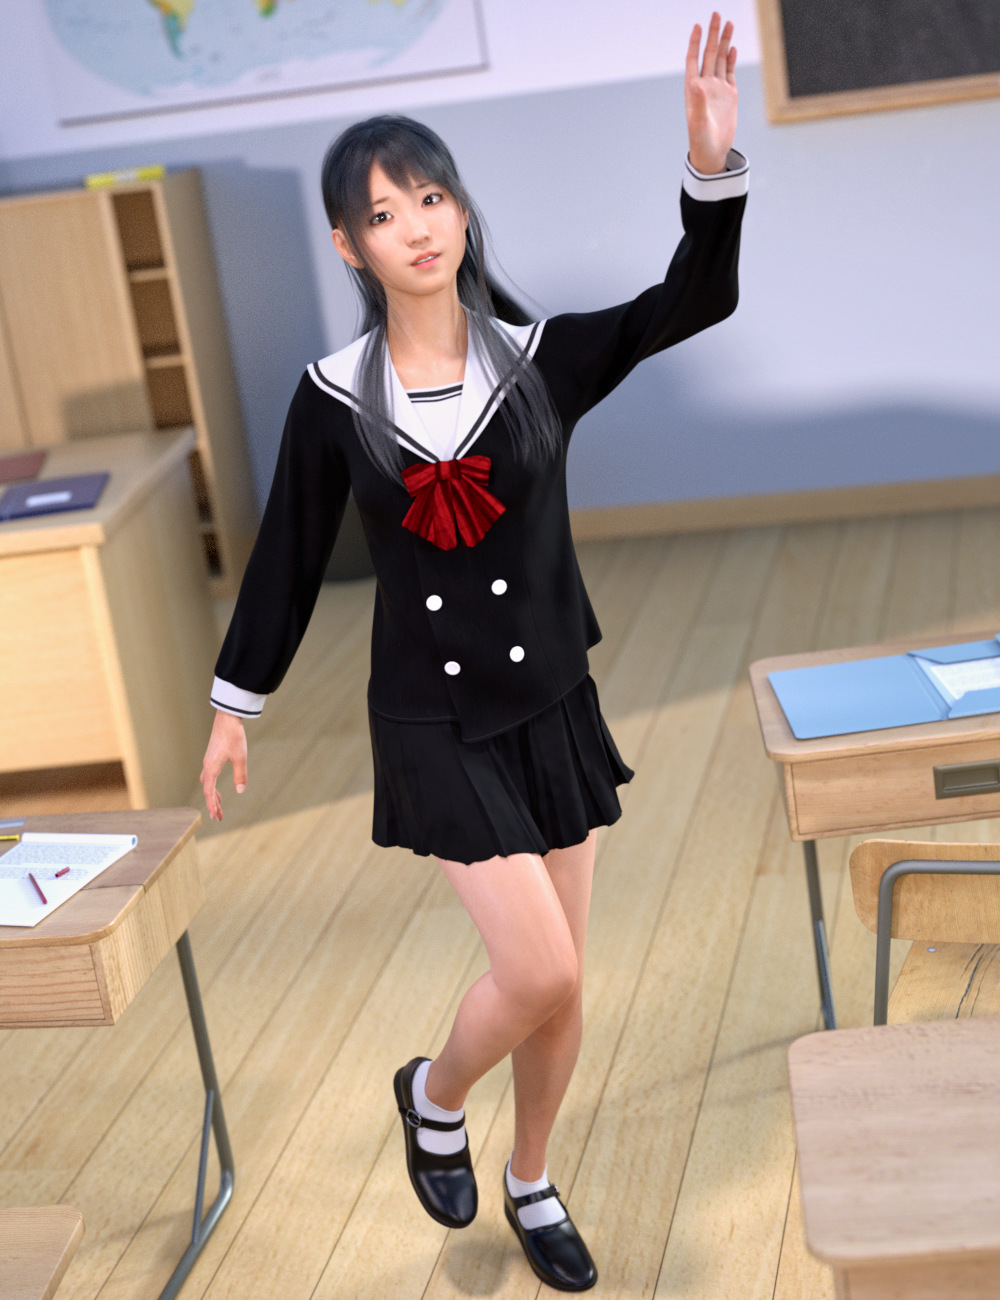 dForce Double Breasted Uniform for Genesis 8 Female(s) by: tentman, 3D Models by Daz 3D